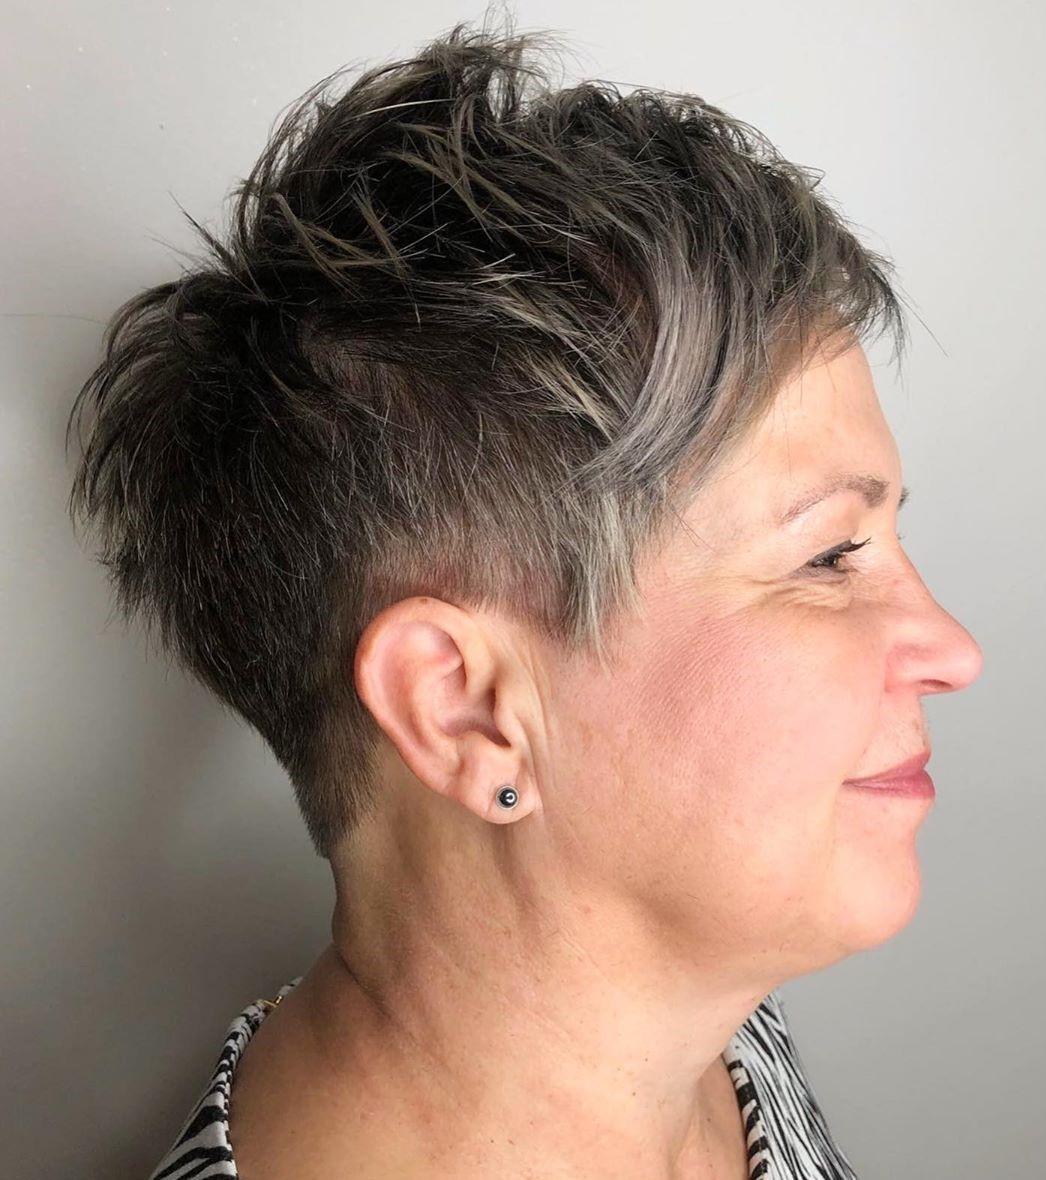 Older Women's Textured Cut with Undercut